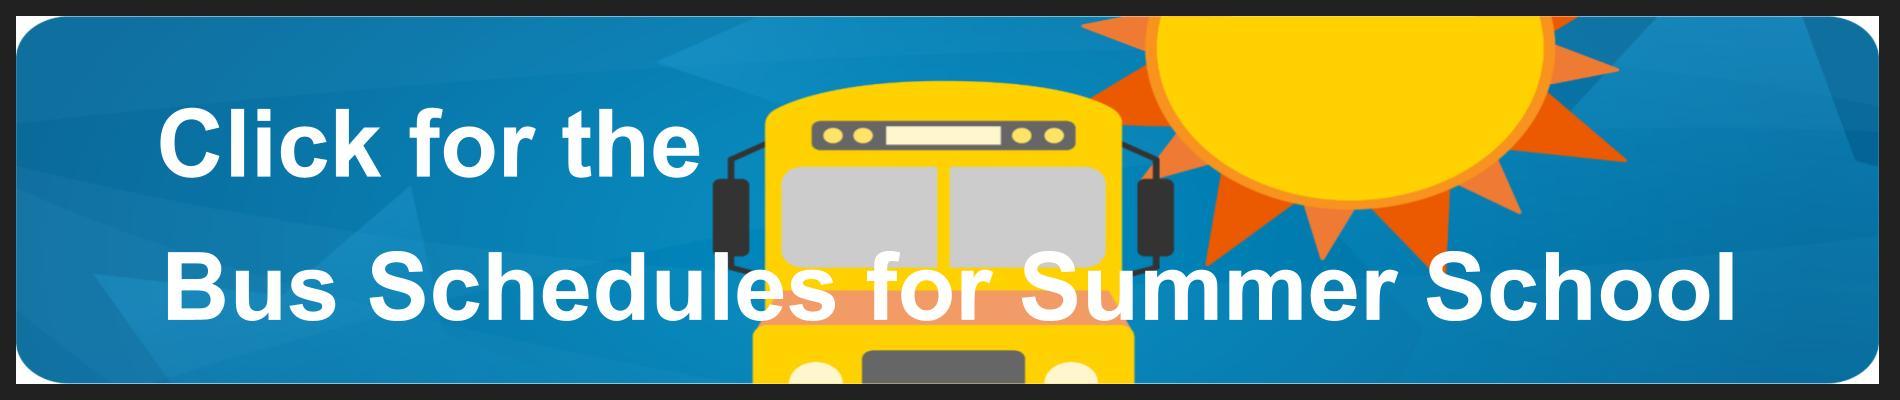 Summer School Bus